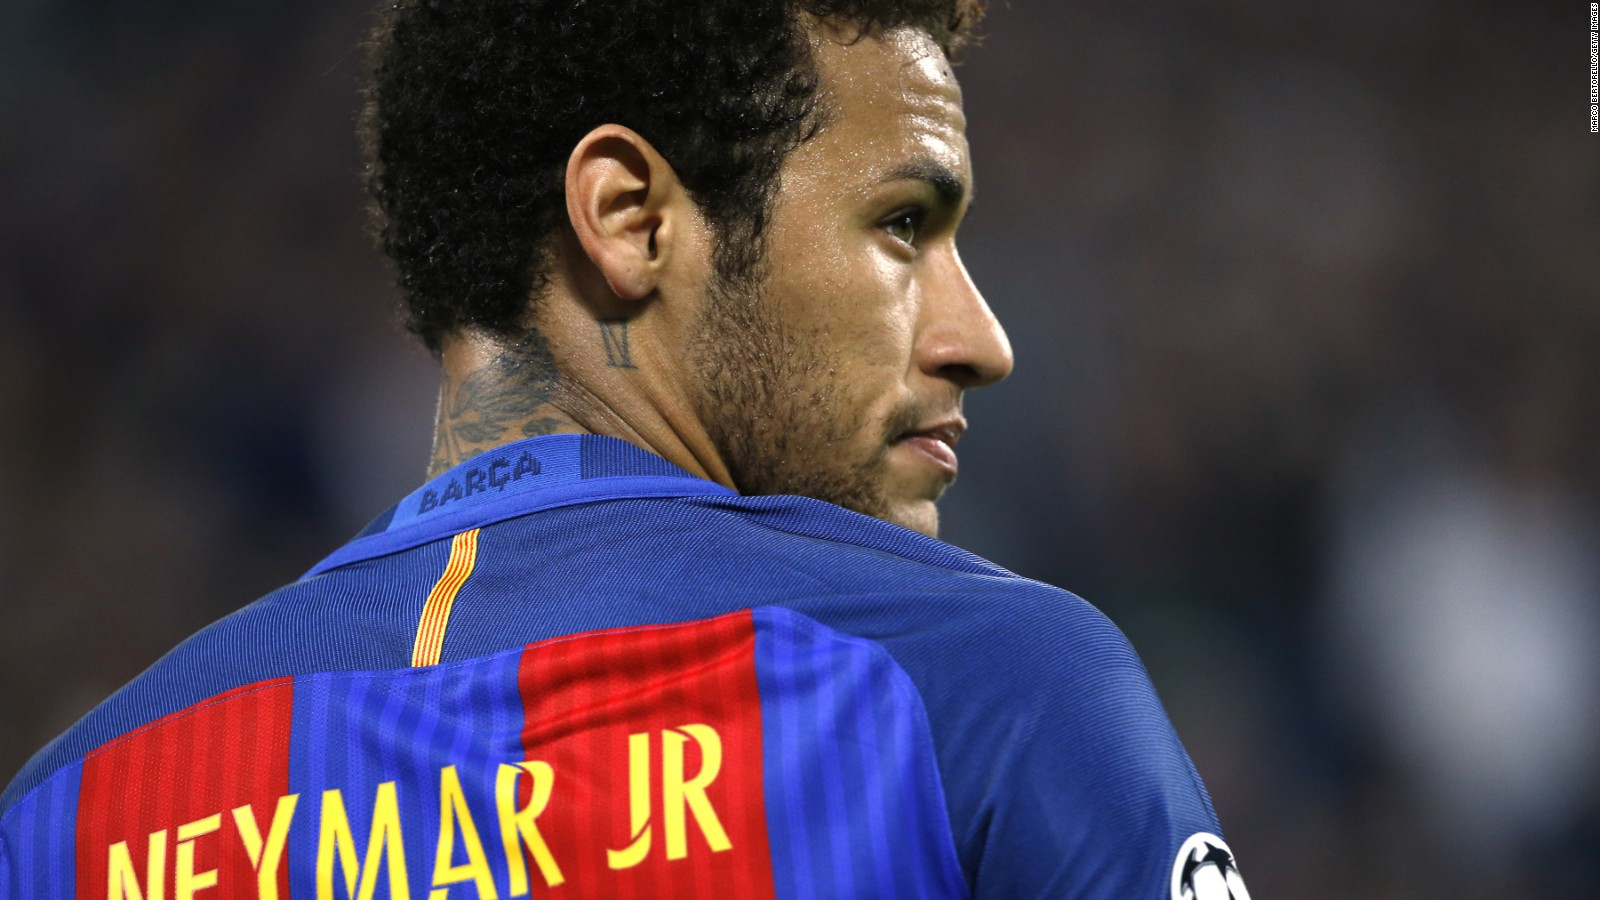 Neymar Signs 5 Year Deal With Paris Saint Germain Cnn